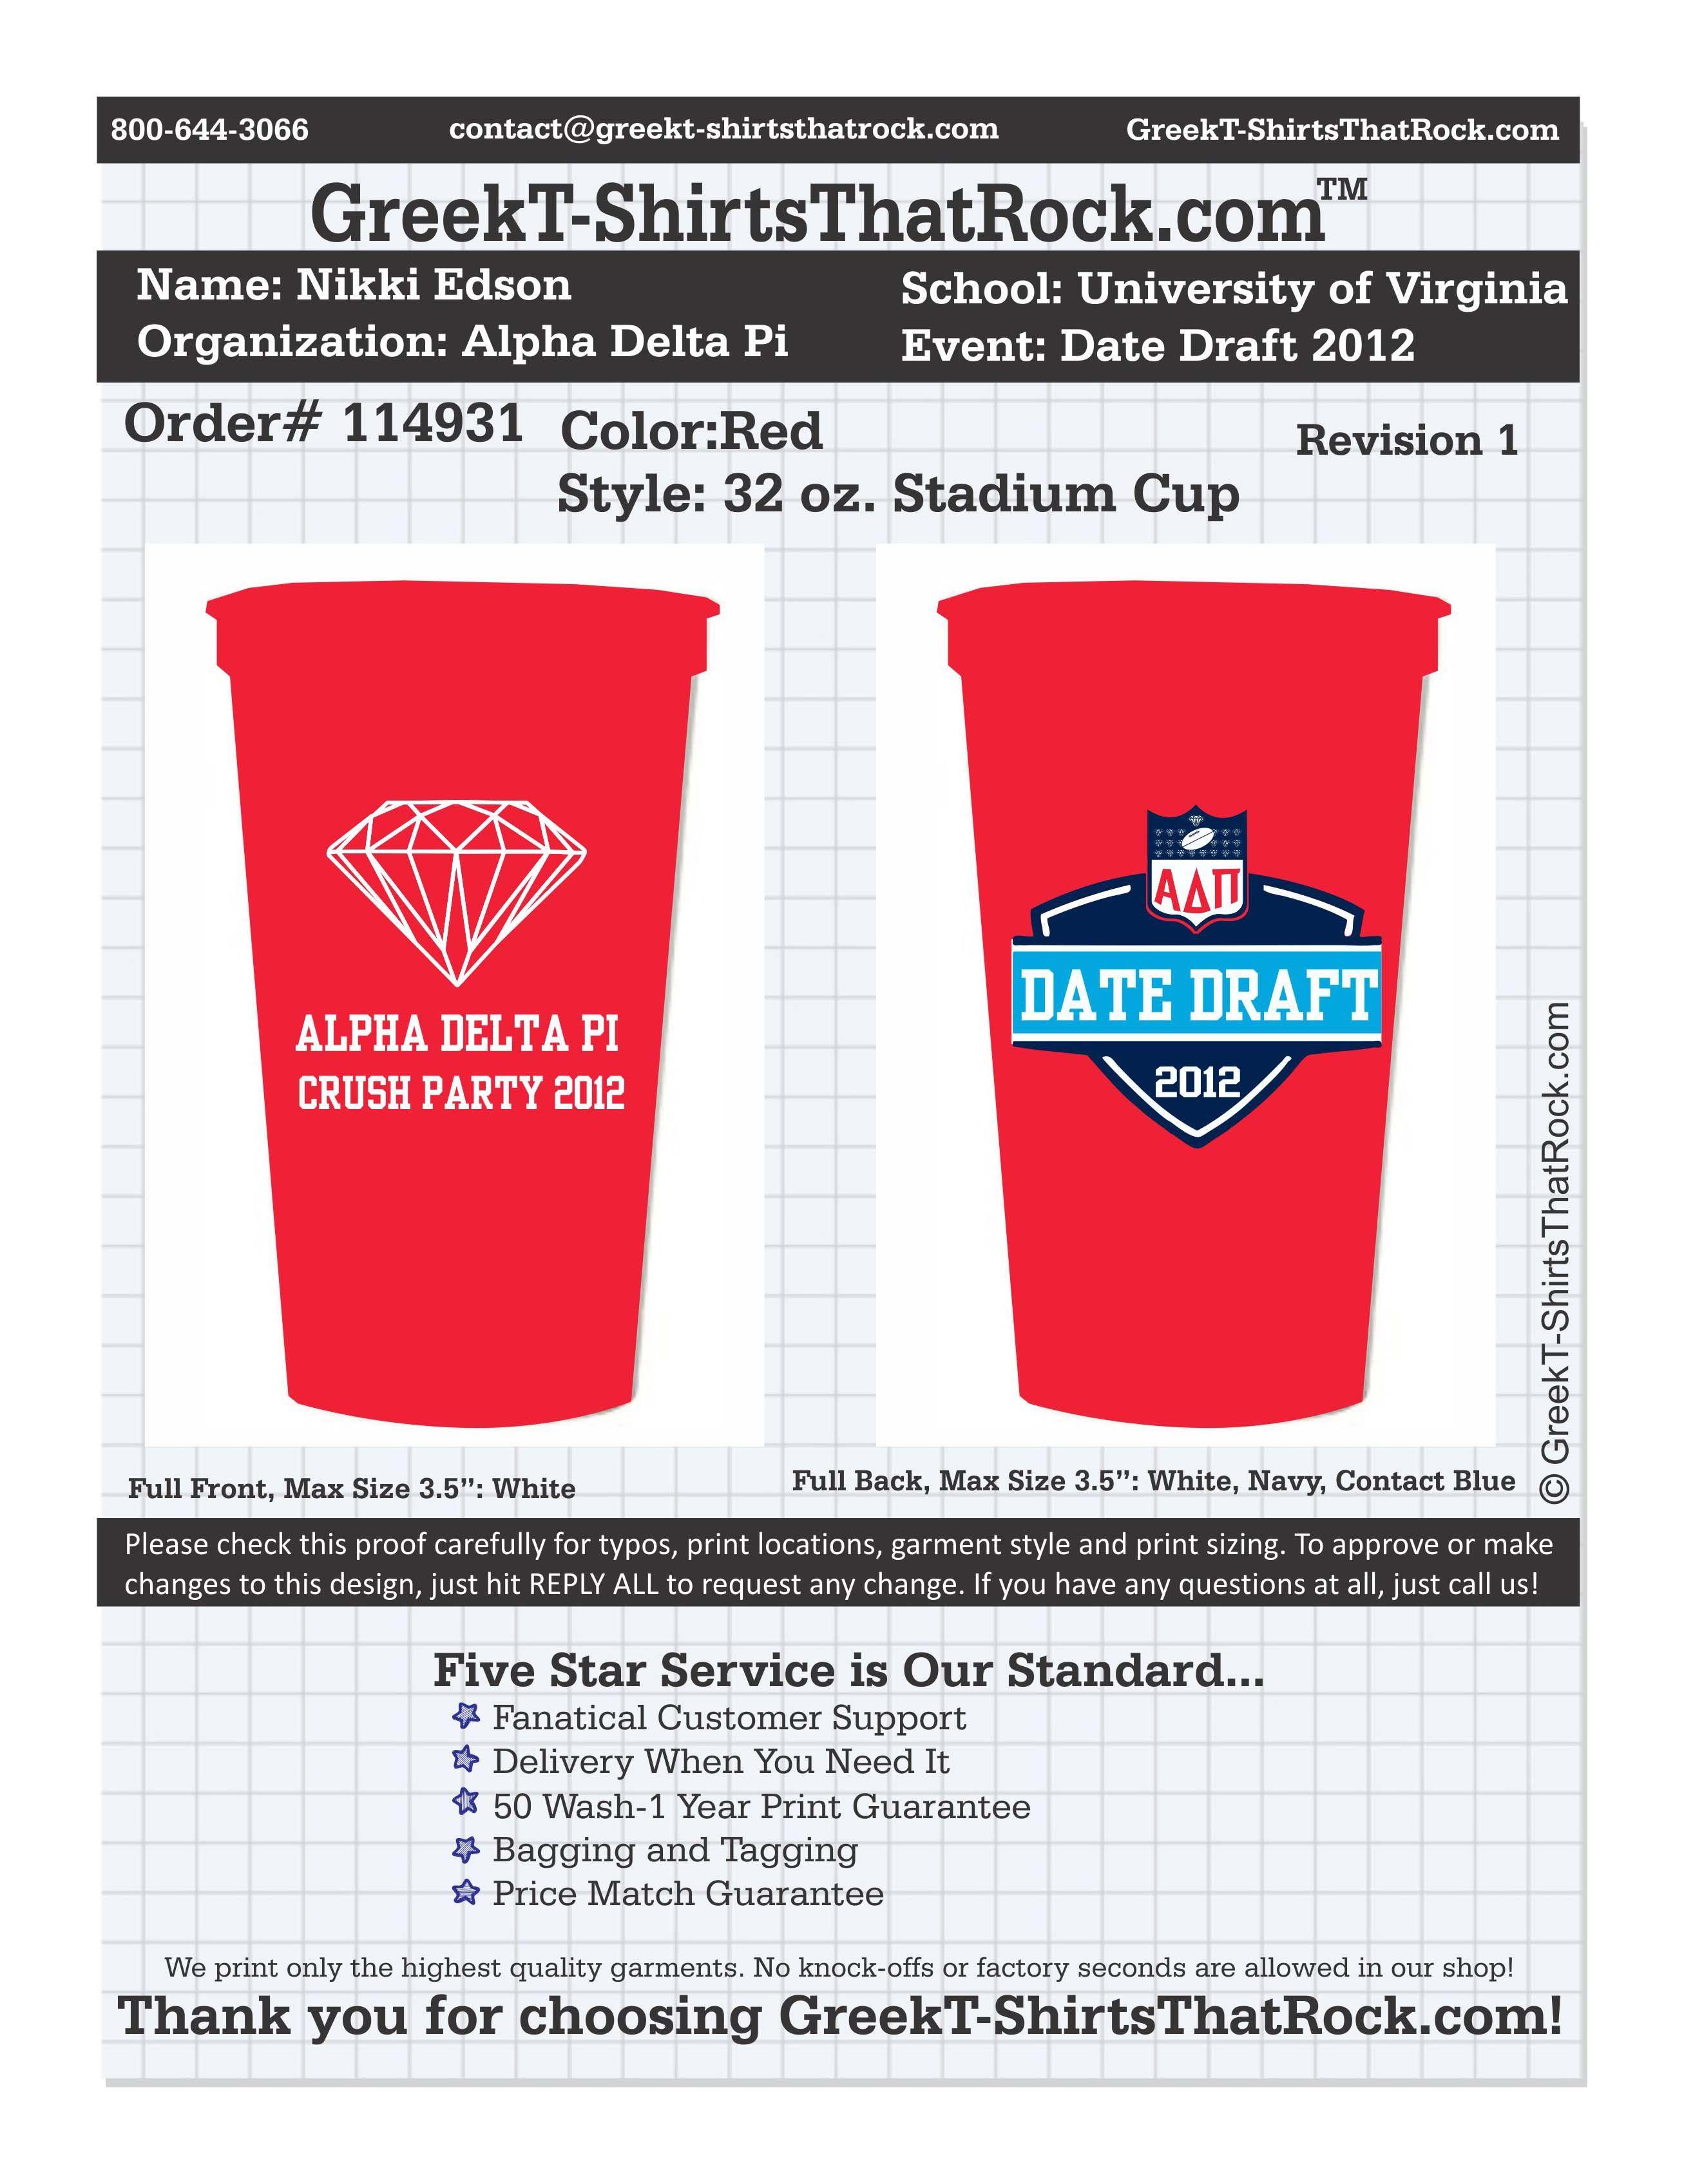 Alpha Delta Pi Crush Party University Of Virginia Adpi Date Draft Greek Tshirts That Rock Alpha Delta Pi Adpi Gphi